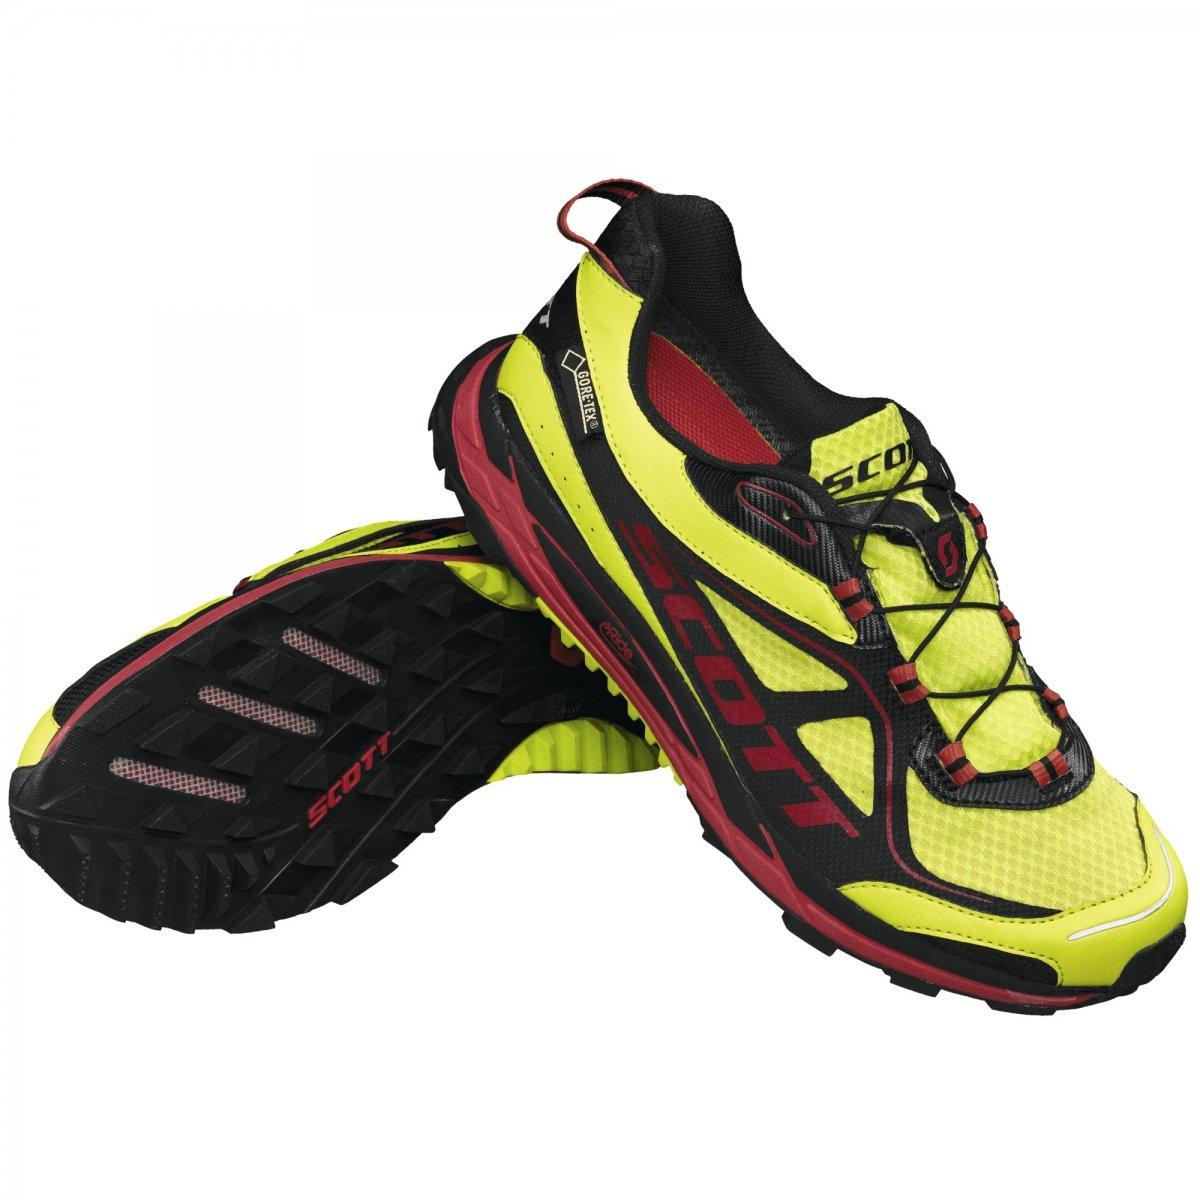 SCOTT(スコット) ランニングシューズ eRide Nakoa Trail GTX イエロー、レッド B00I8NUIMQ US9/27cm